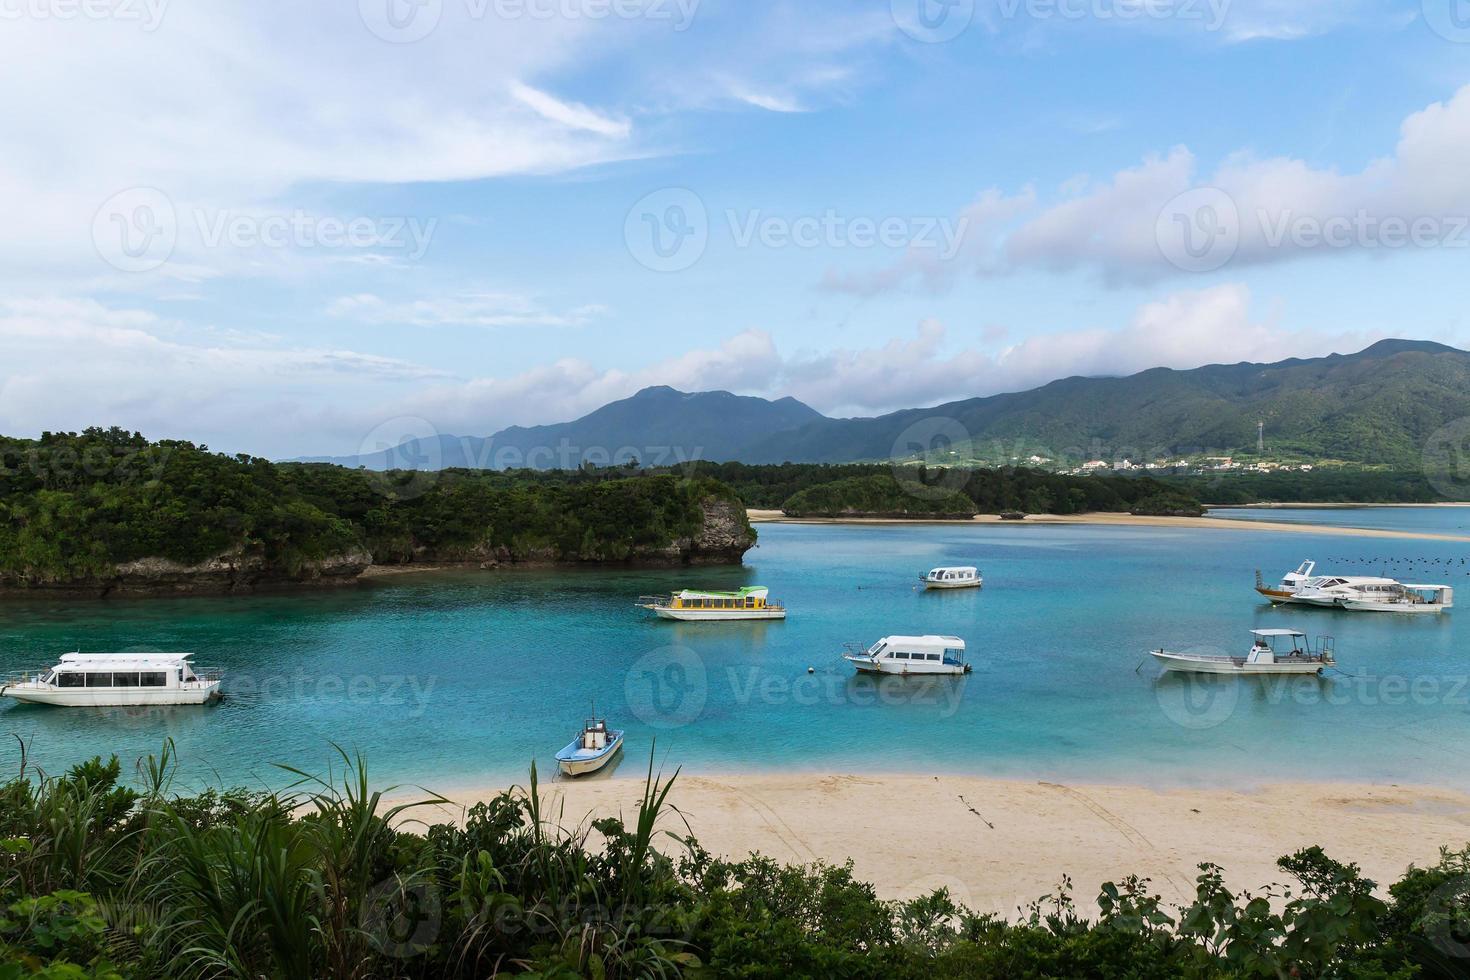 kabira baai in ishigaki eiland, okinawa japan foto